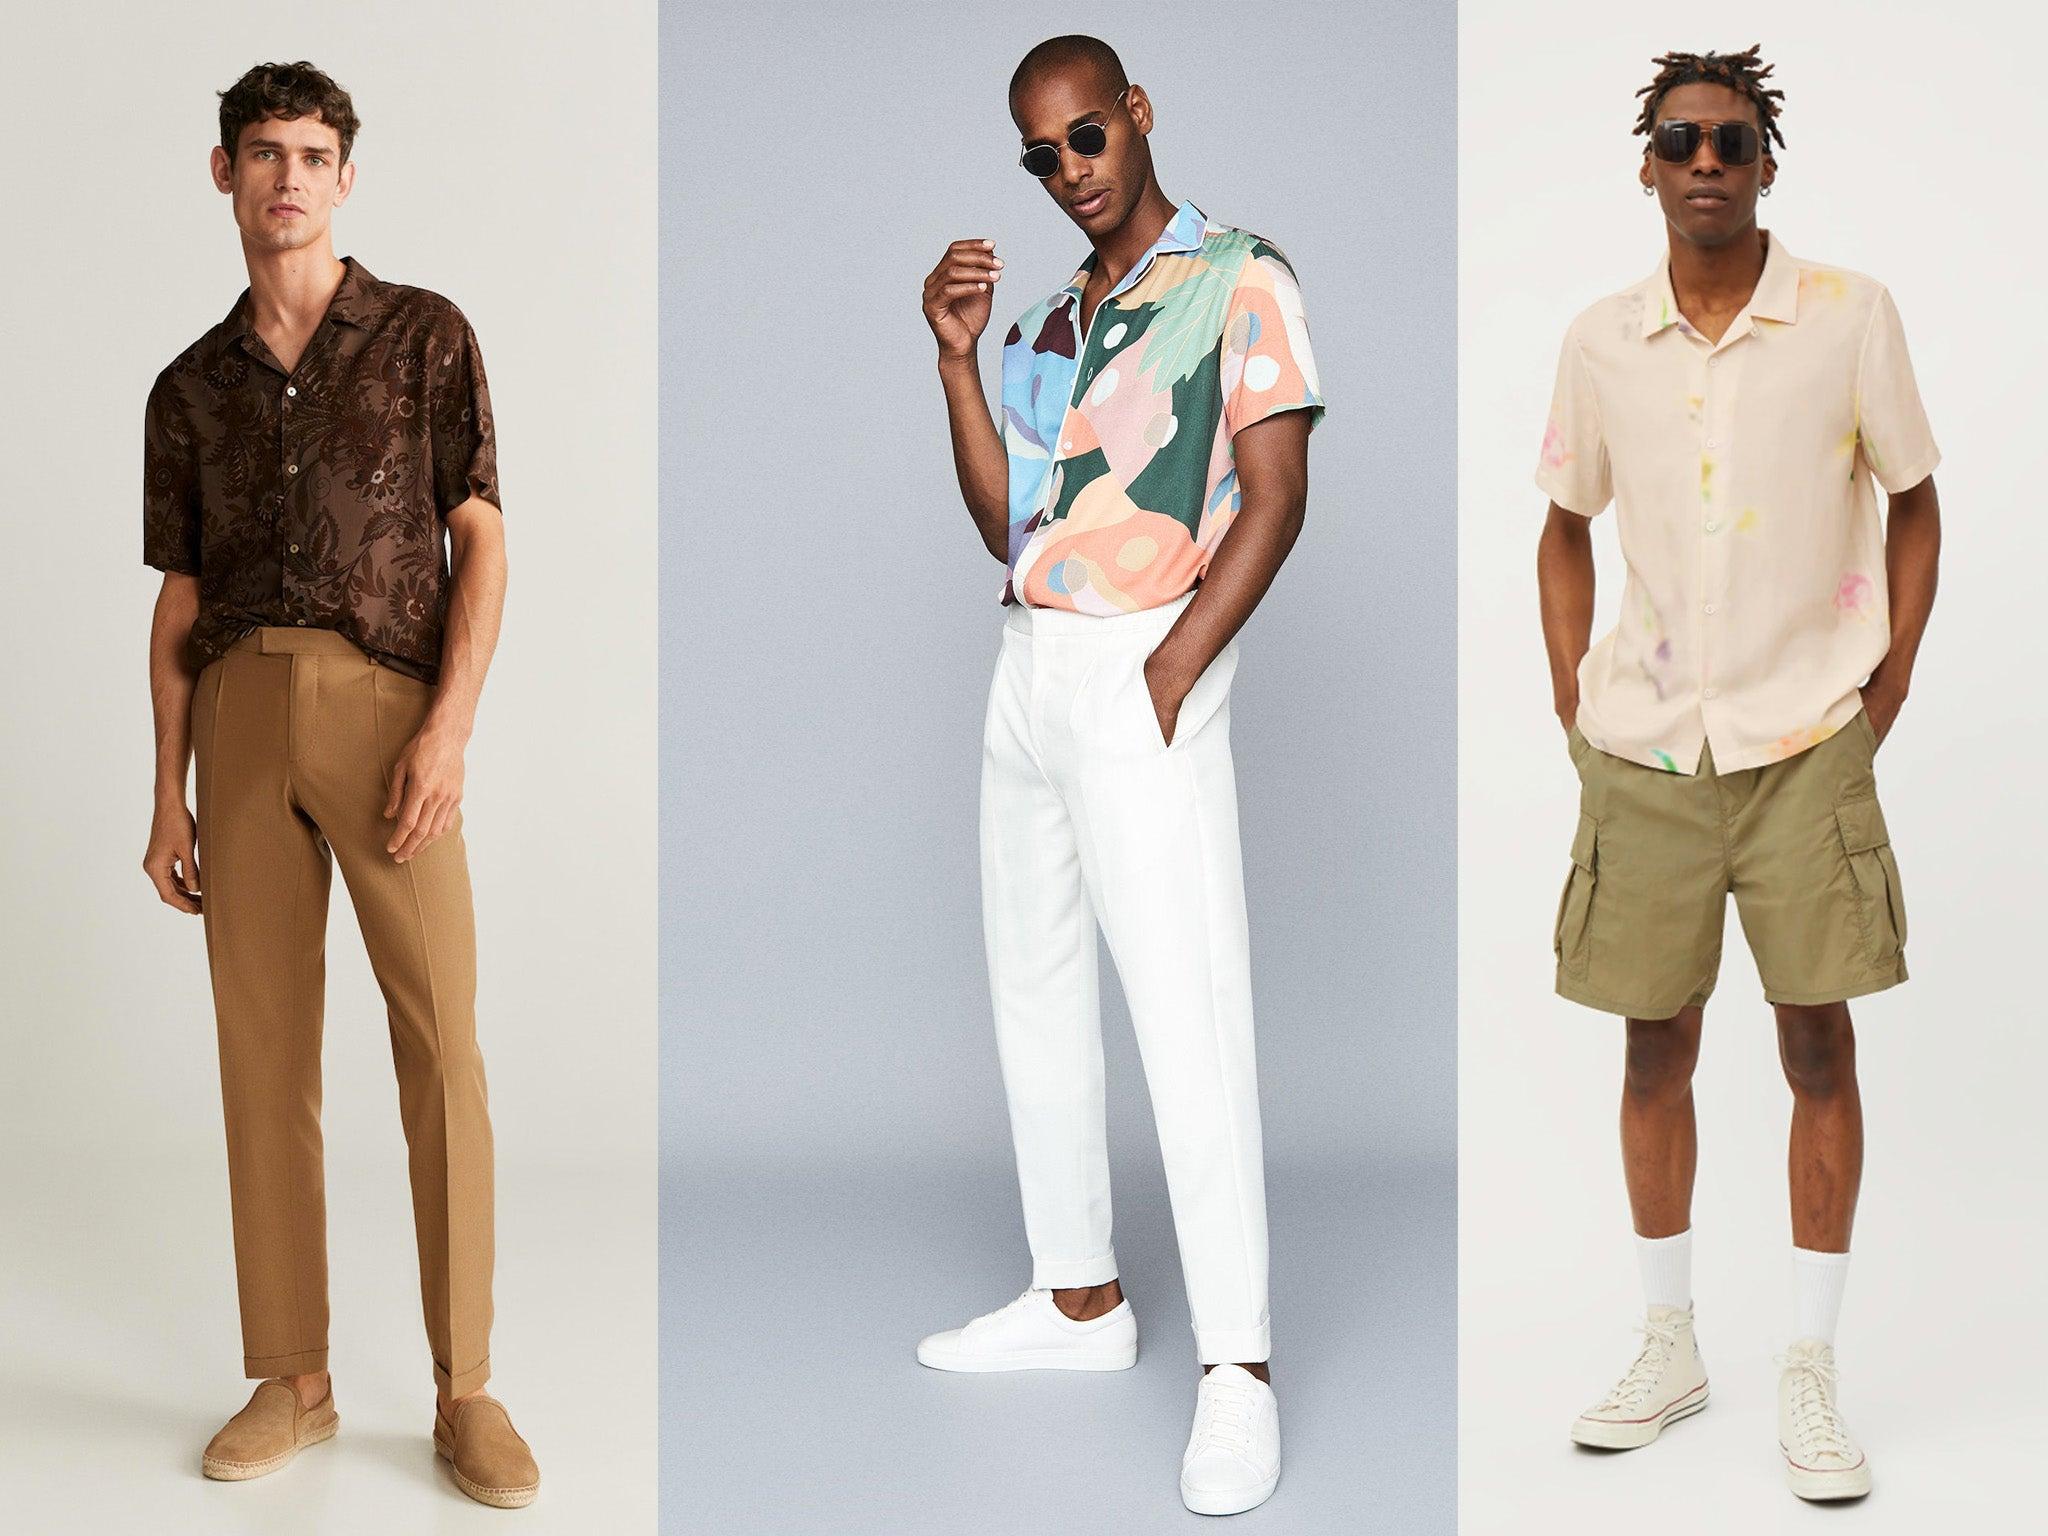 Best summer shirts for men 2020: Short-sleeved styles